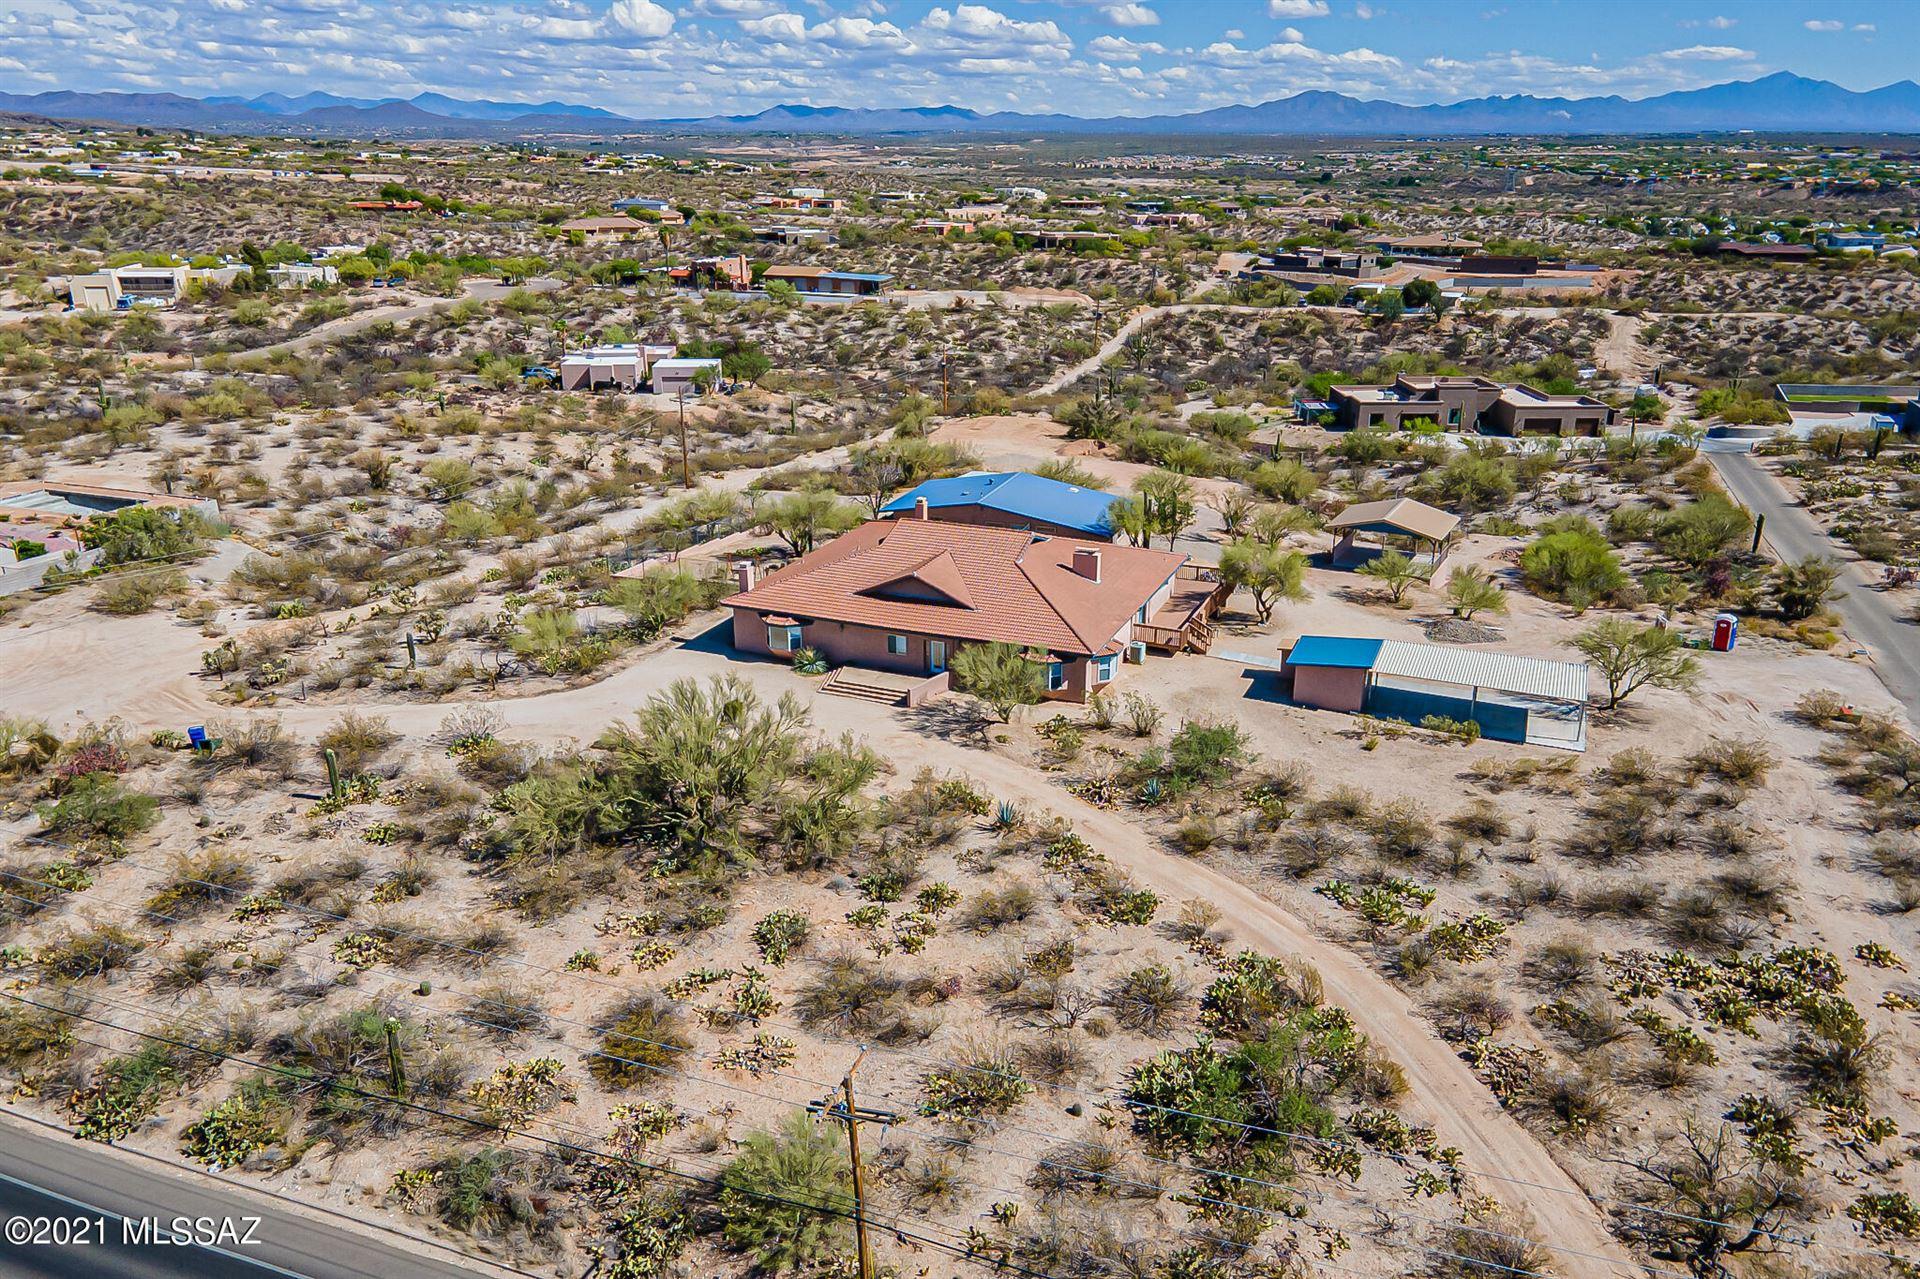 10670 E Escalante Road, Tucson, AZ 85730 - MLS#: 22113580